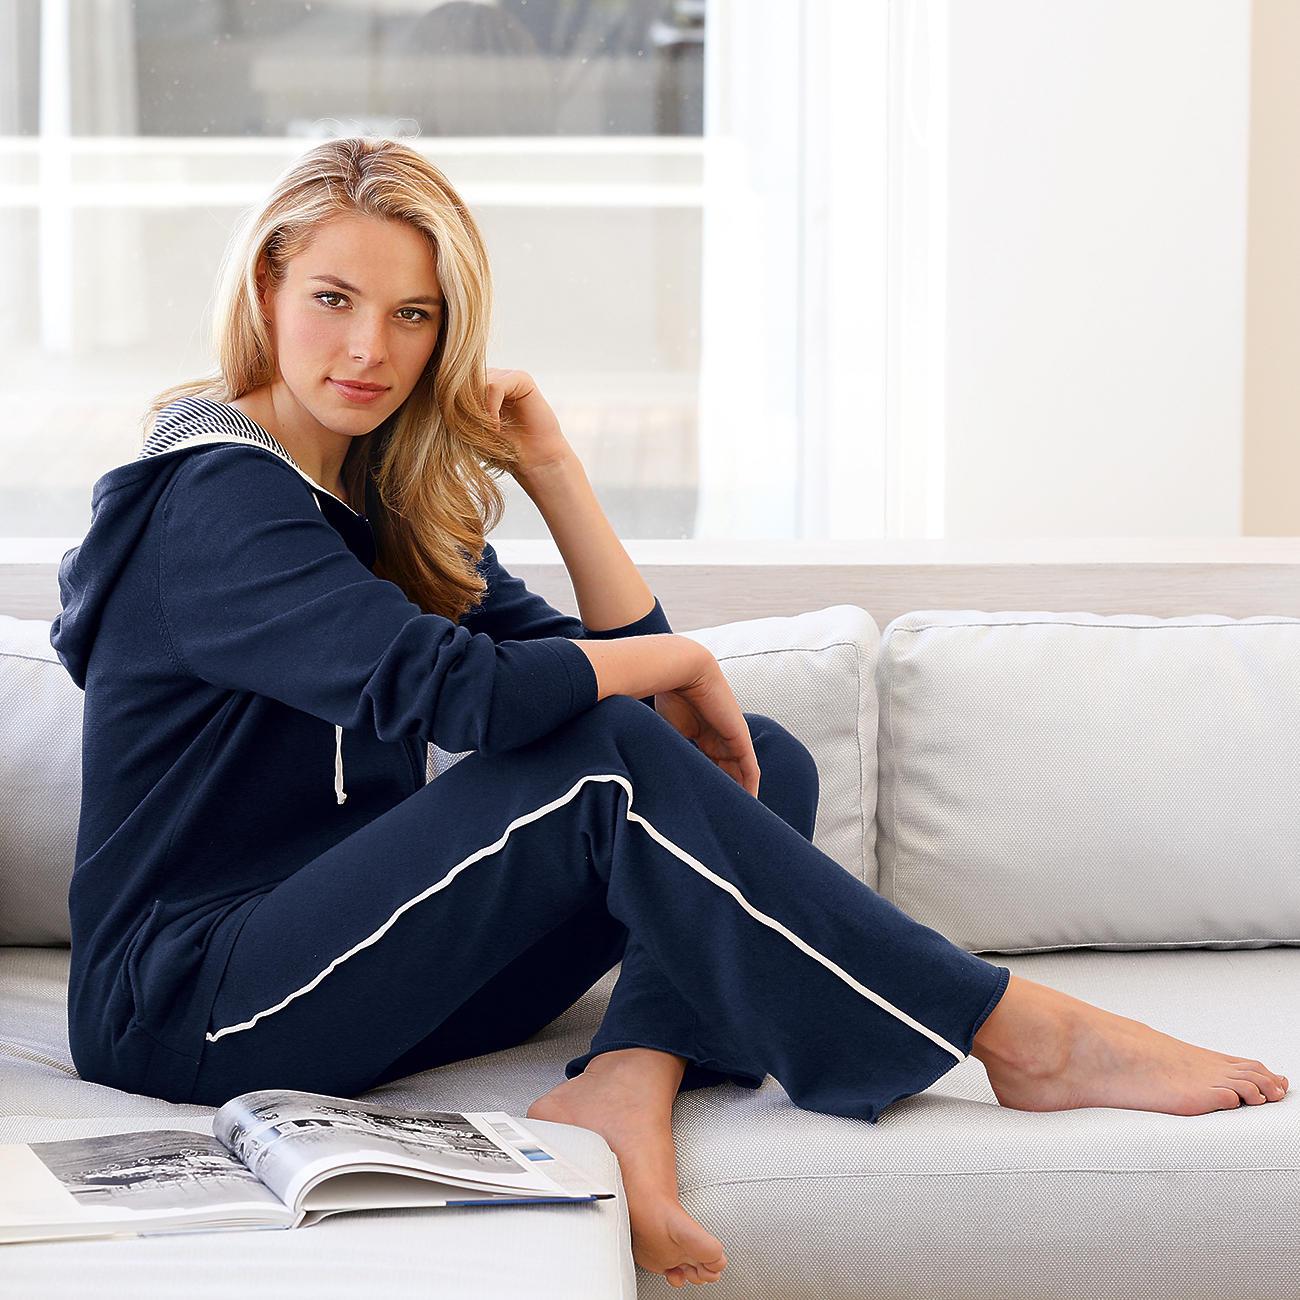 baumwoll kaschmir homesuit 3 jahre garantie pro idee. Black Bedroom Furniture Sets. Home Design Ideas